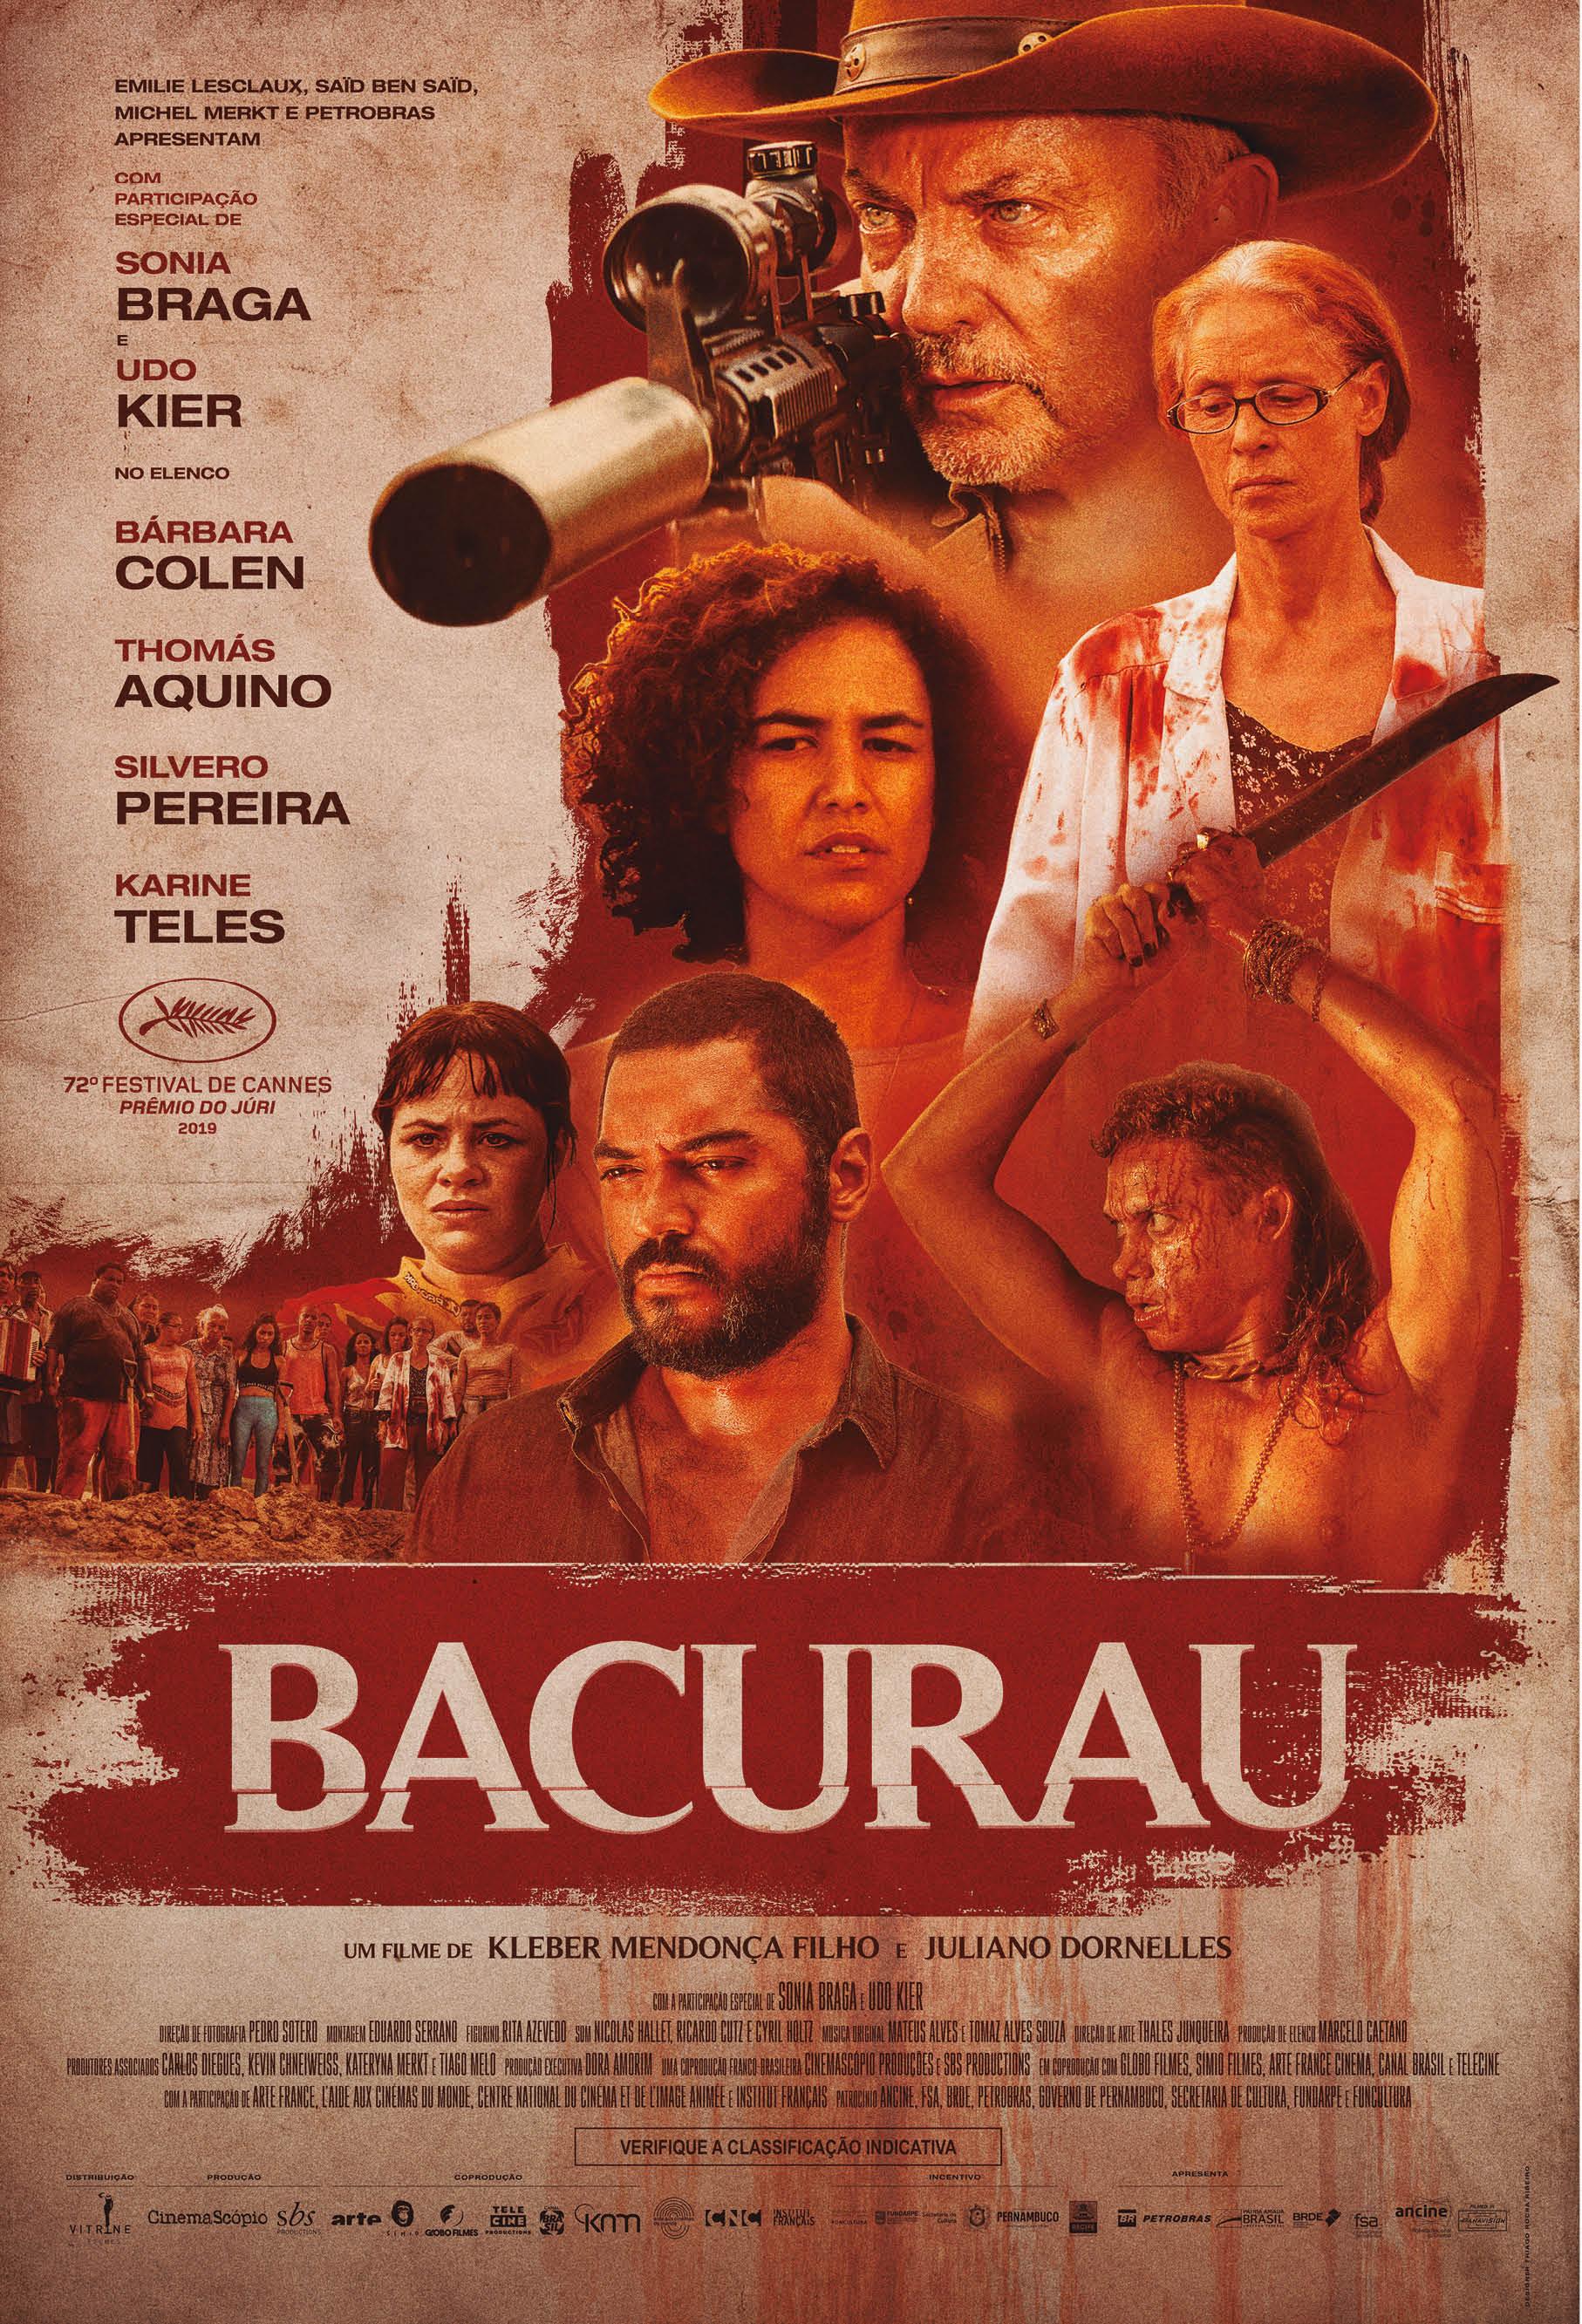 Bacurau film poster